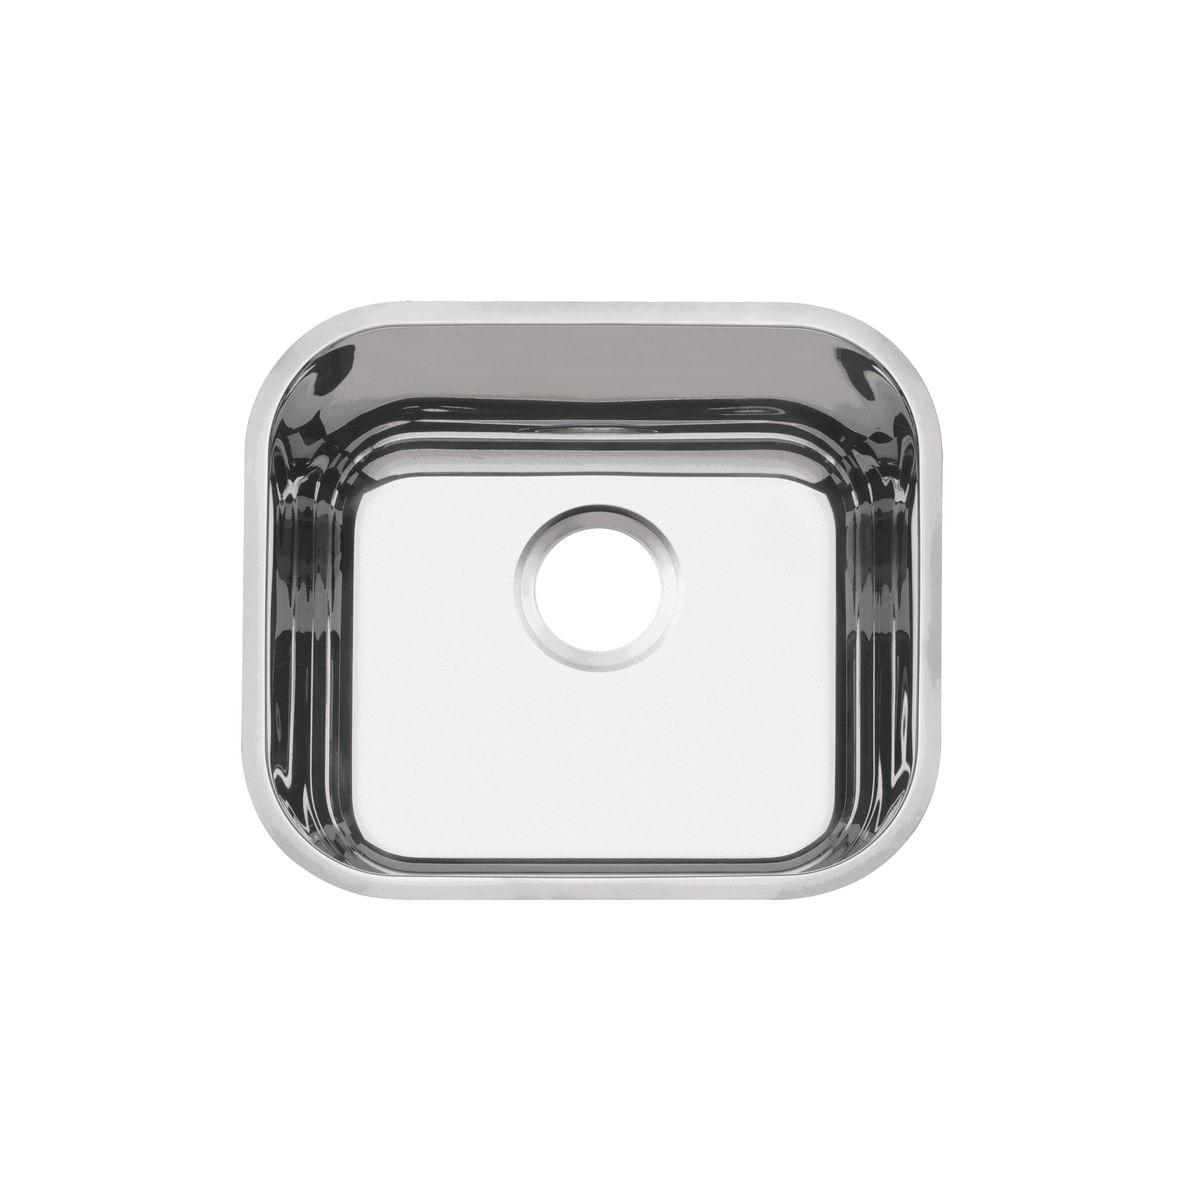 Cuba n.0 Tramontina Lavínia 40 BL Perfecta em Aço Inox 304 Polido 40 x 34 x 14 cm Sem Válvula